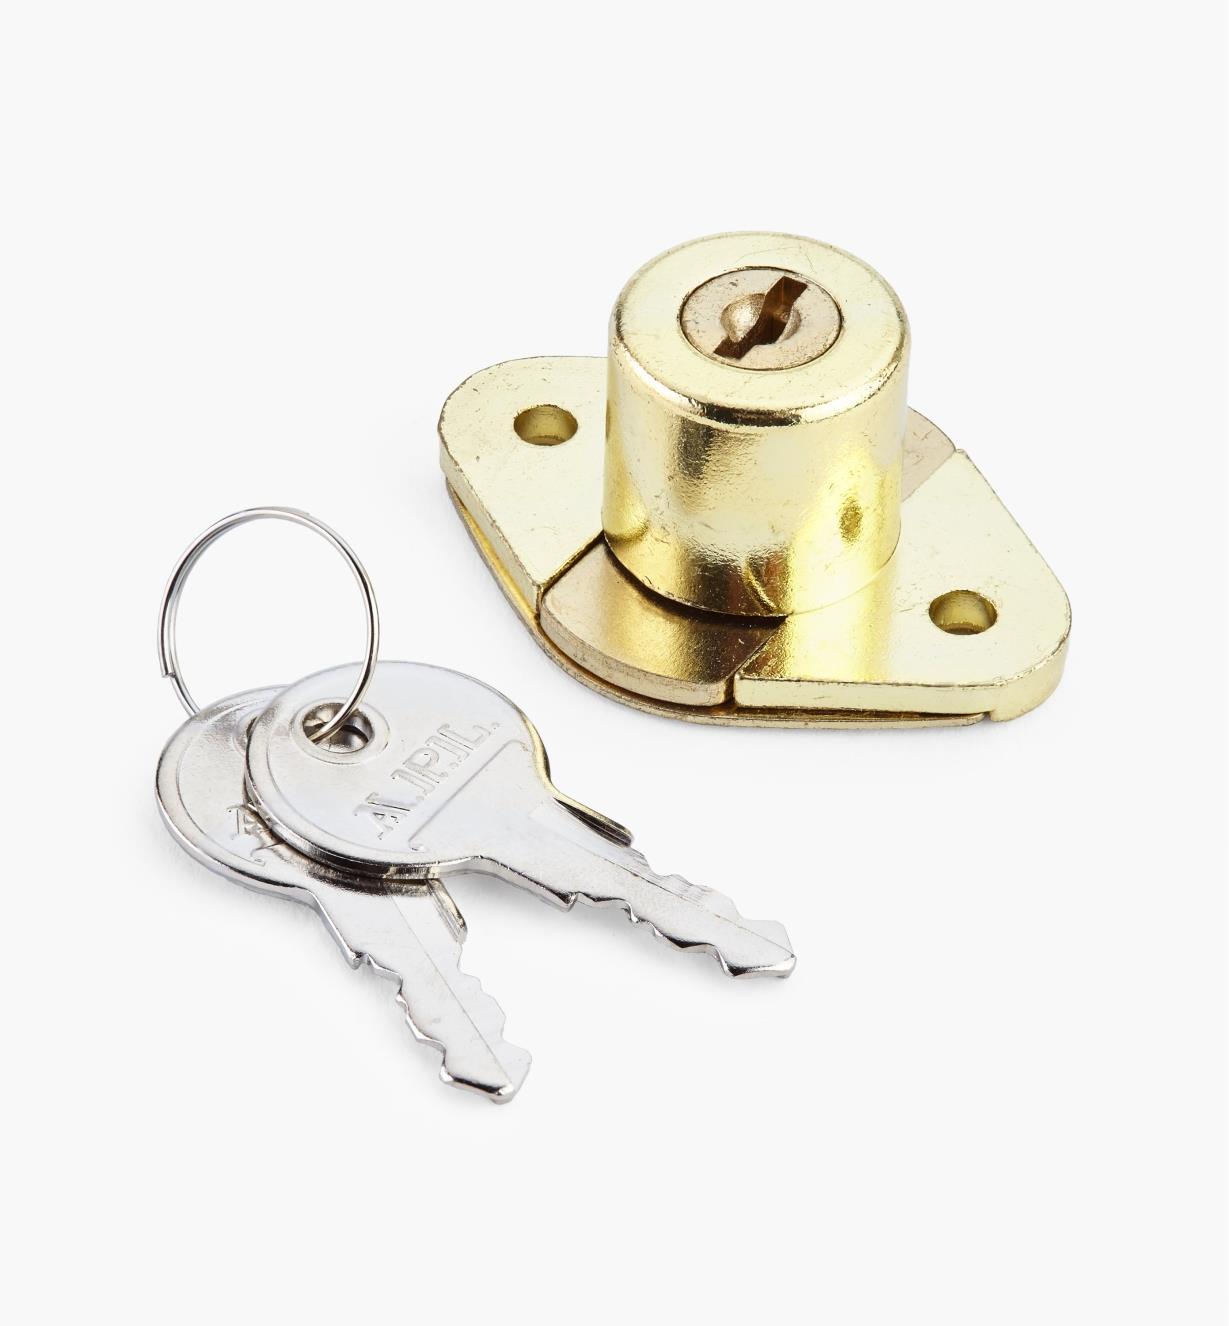 00N2410 - Drawer/Door Lock